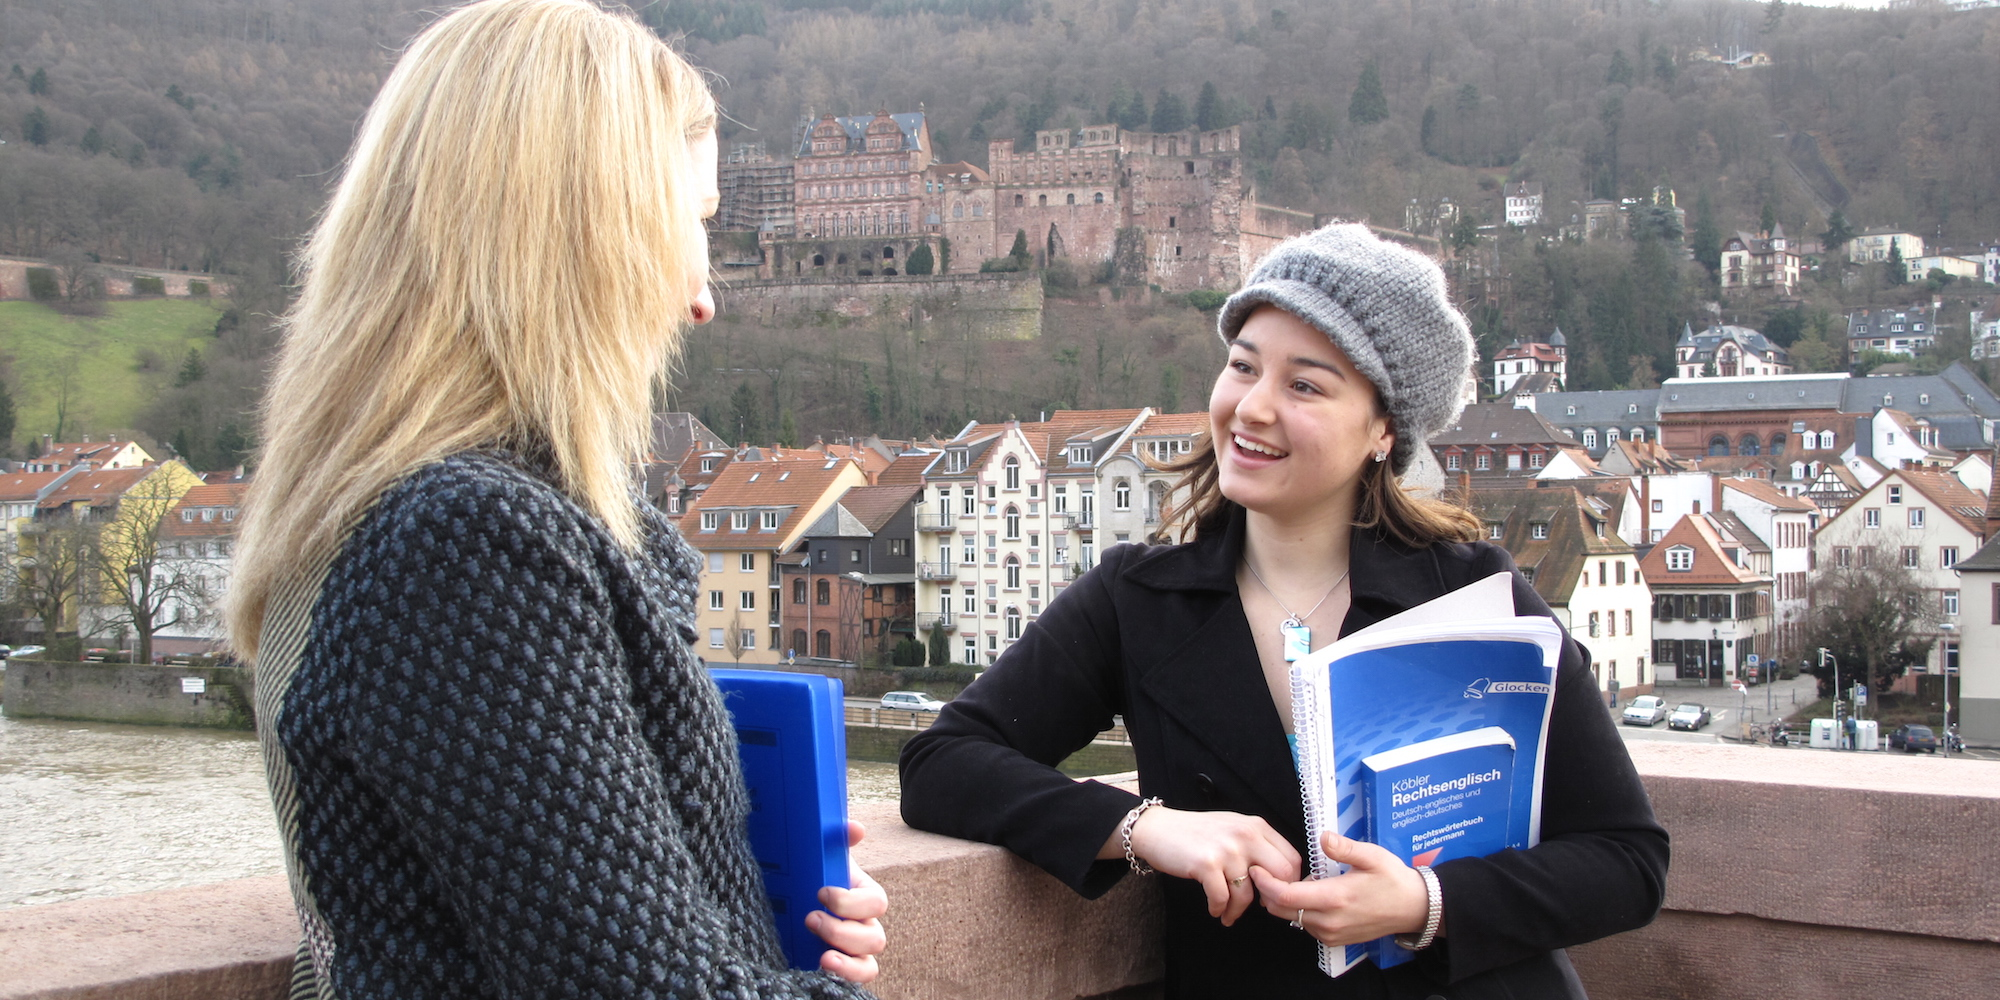 Courtney Ford at Rupert Charles University of Heidelberg